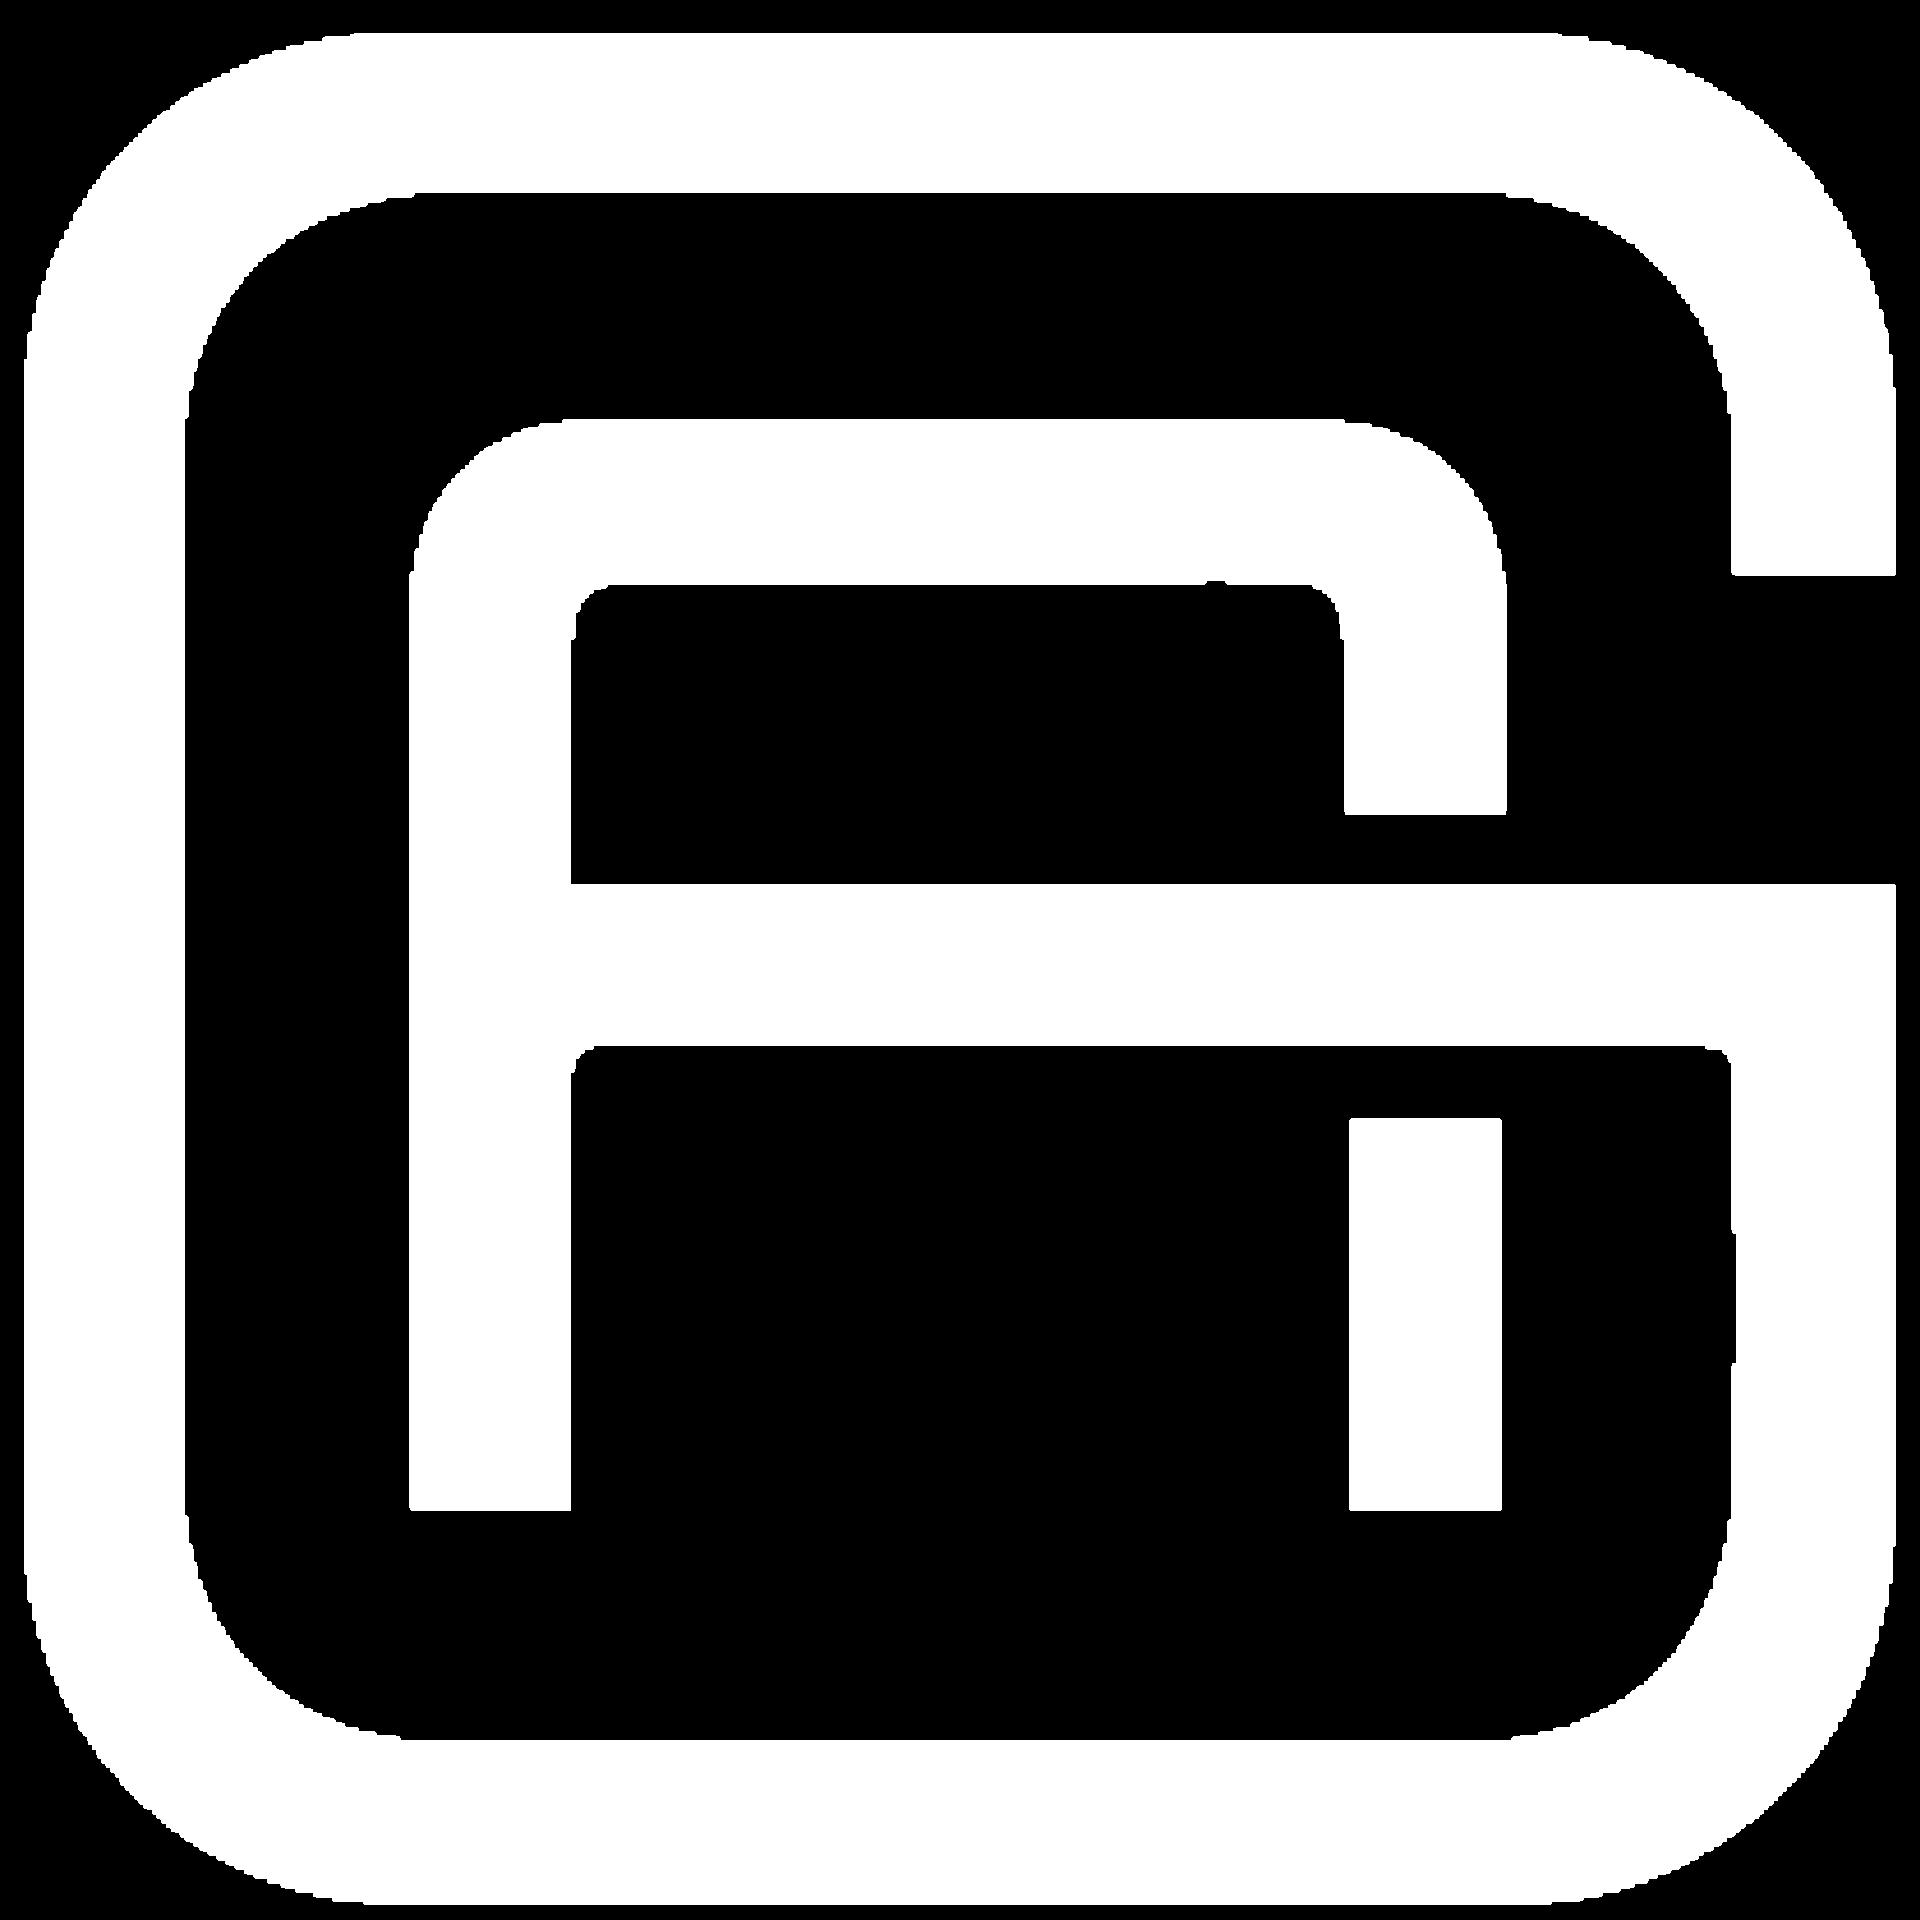 GOLFARGENTINO